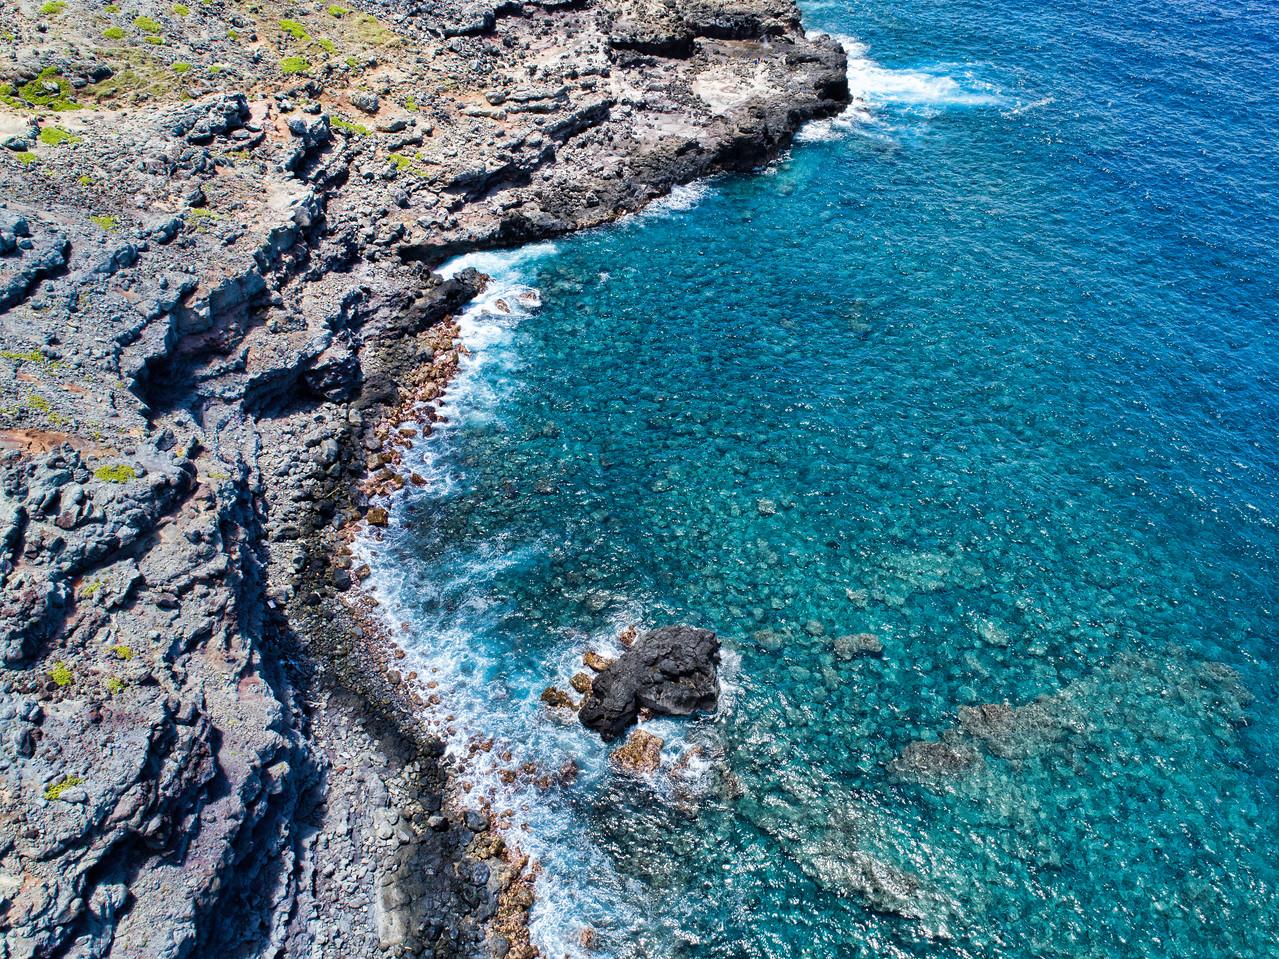 North west Maui near the blow hole.